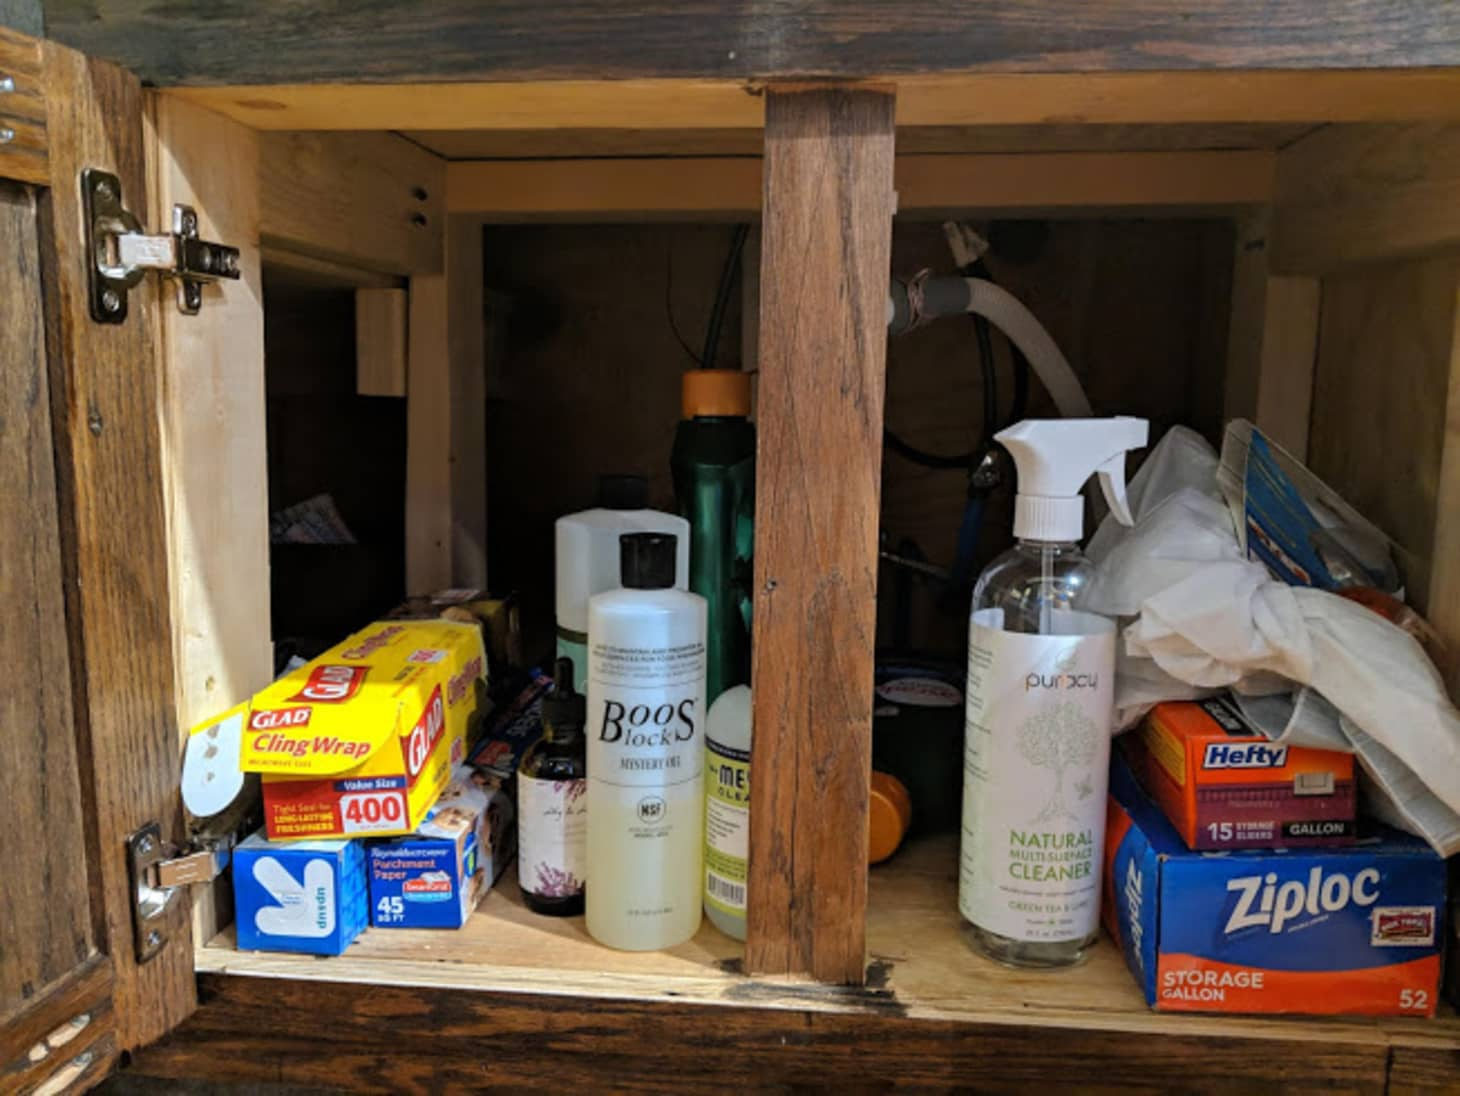 Kitchen Sink Cabinet Organizer Solution | Apartment Therapy